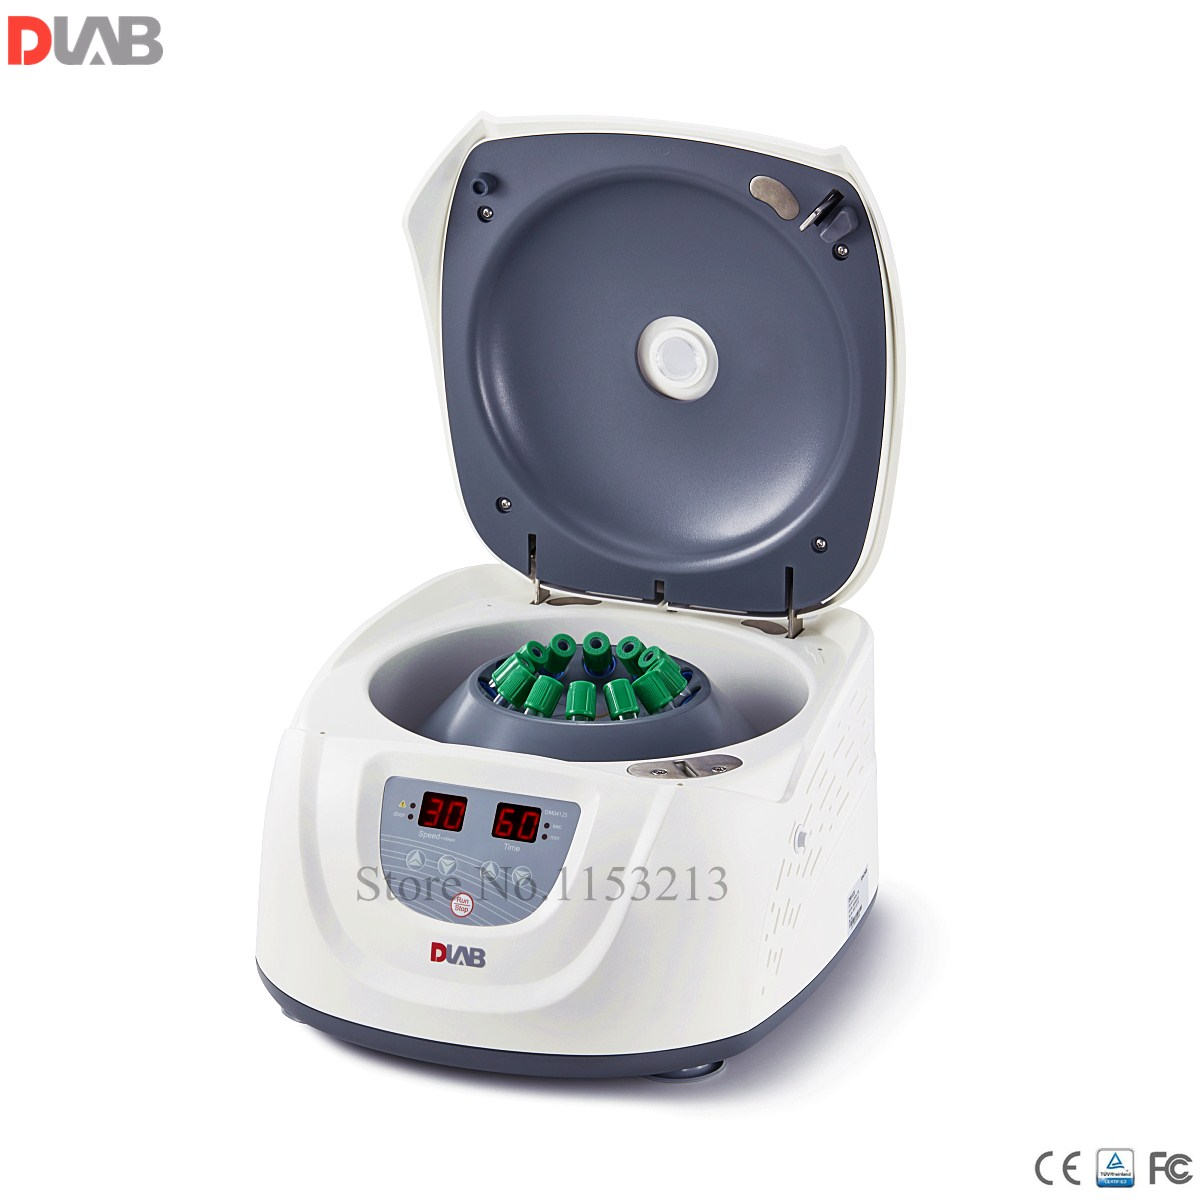 Dragón laboratorio DM0412S tipo económico clínica centrífuga 15 ml * 8 o 10 ml/7 ml/5 ml * 12 dlab lenta velocidad centrífuga 300-4500 rpm motor DC